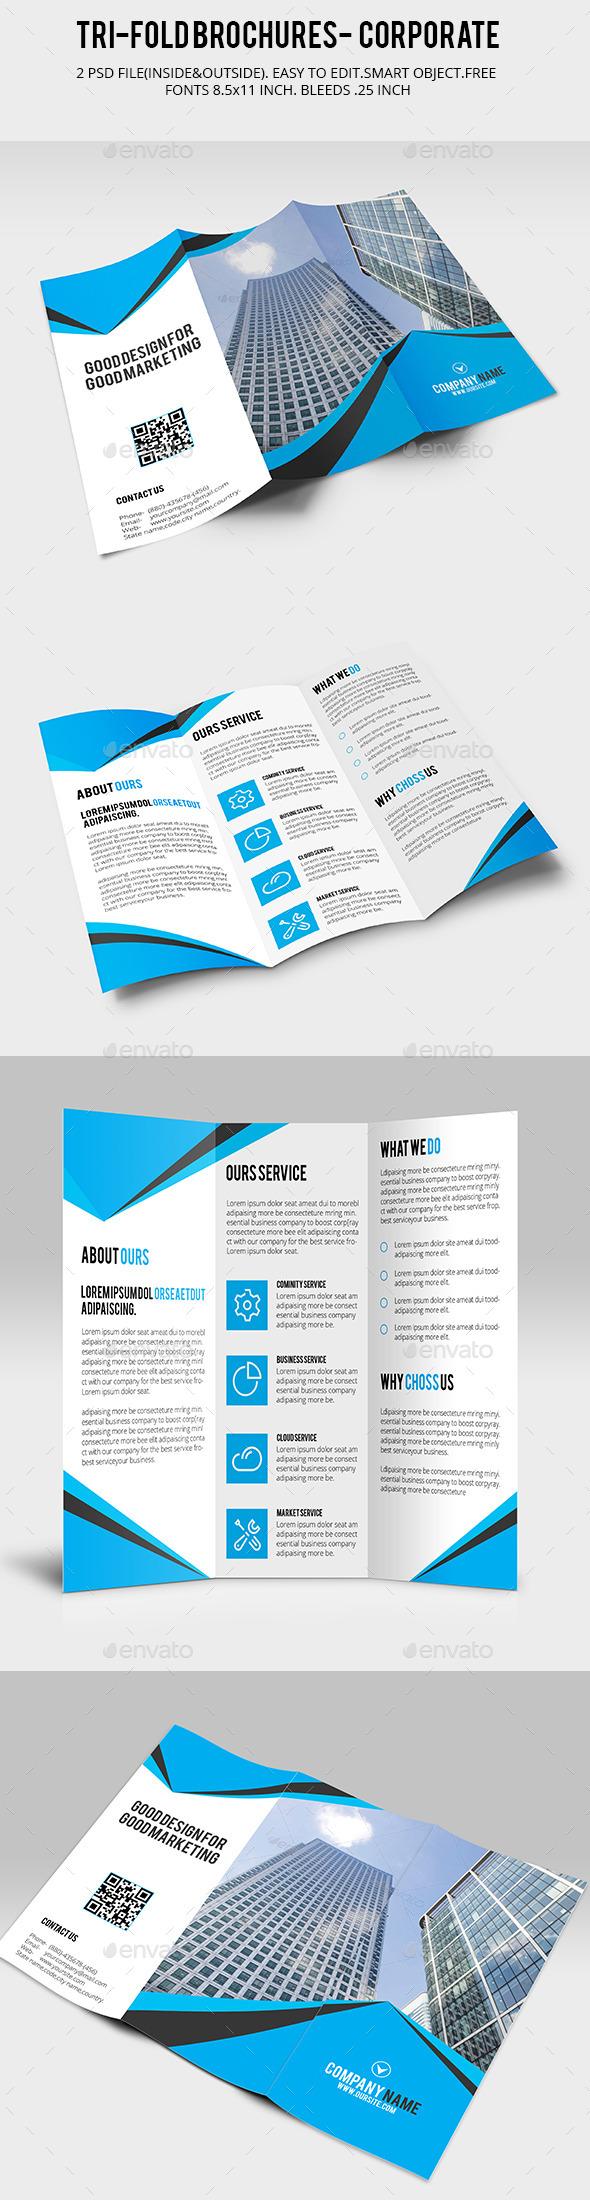 Corporate Tri-Fold Brochure V01 - Corporate Brochures